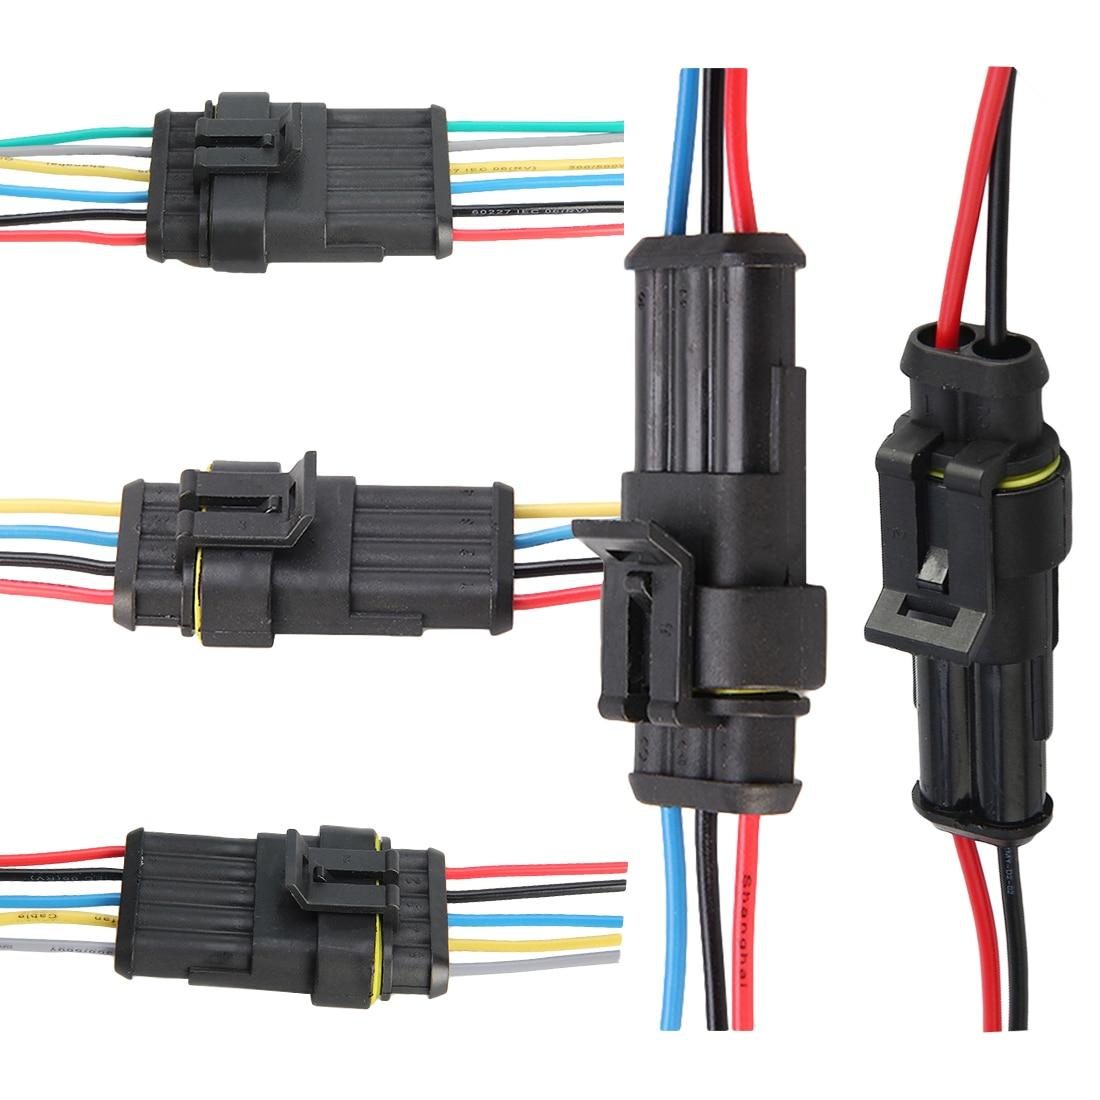 Auto Wire Connector 2 3 4 5 6 Way 2p 3p 4p 5p Auto